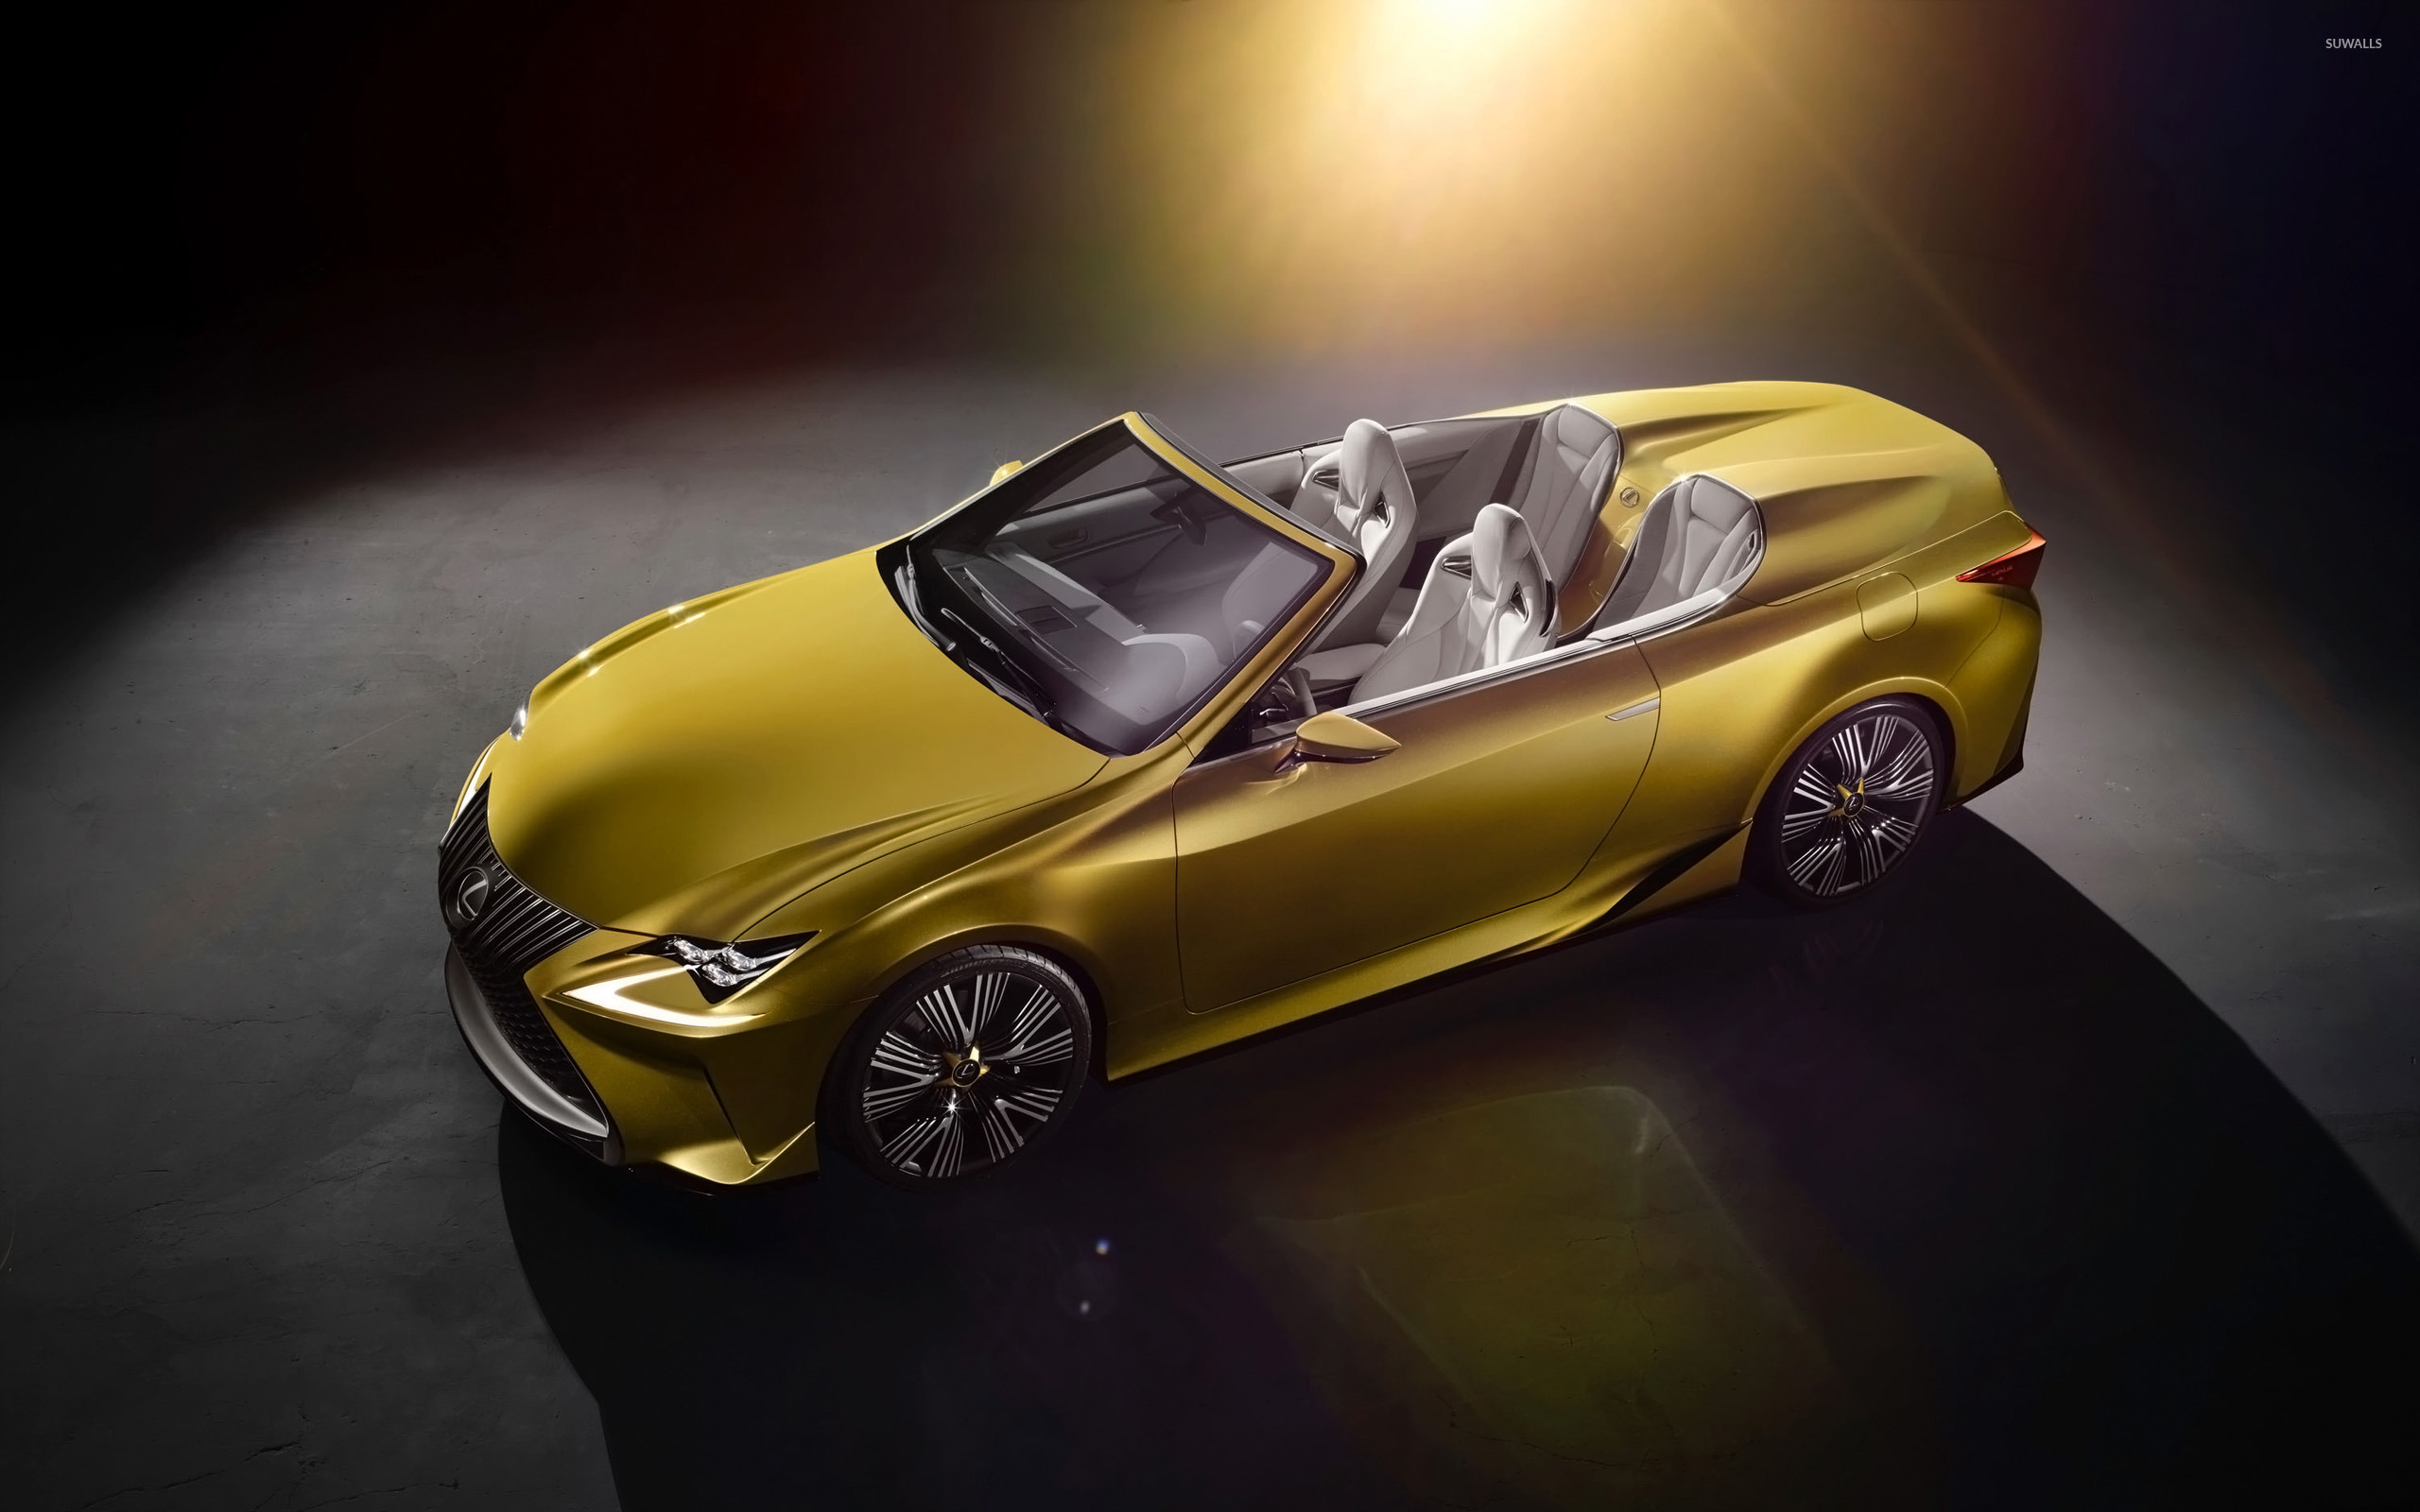 https://cdn.suwalls.com/wallpapers/cars/2014-lexus-lf-c2-concept-46751-2560x1600.jpg